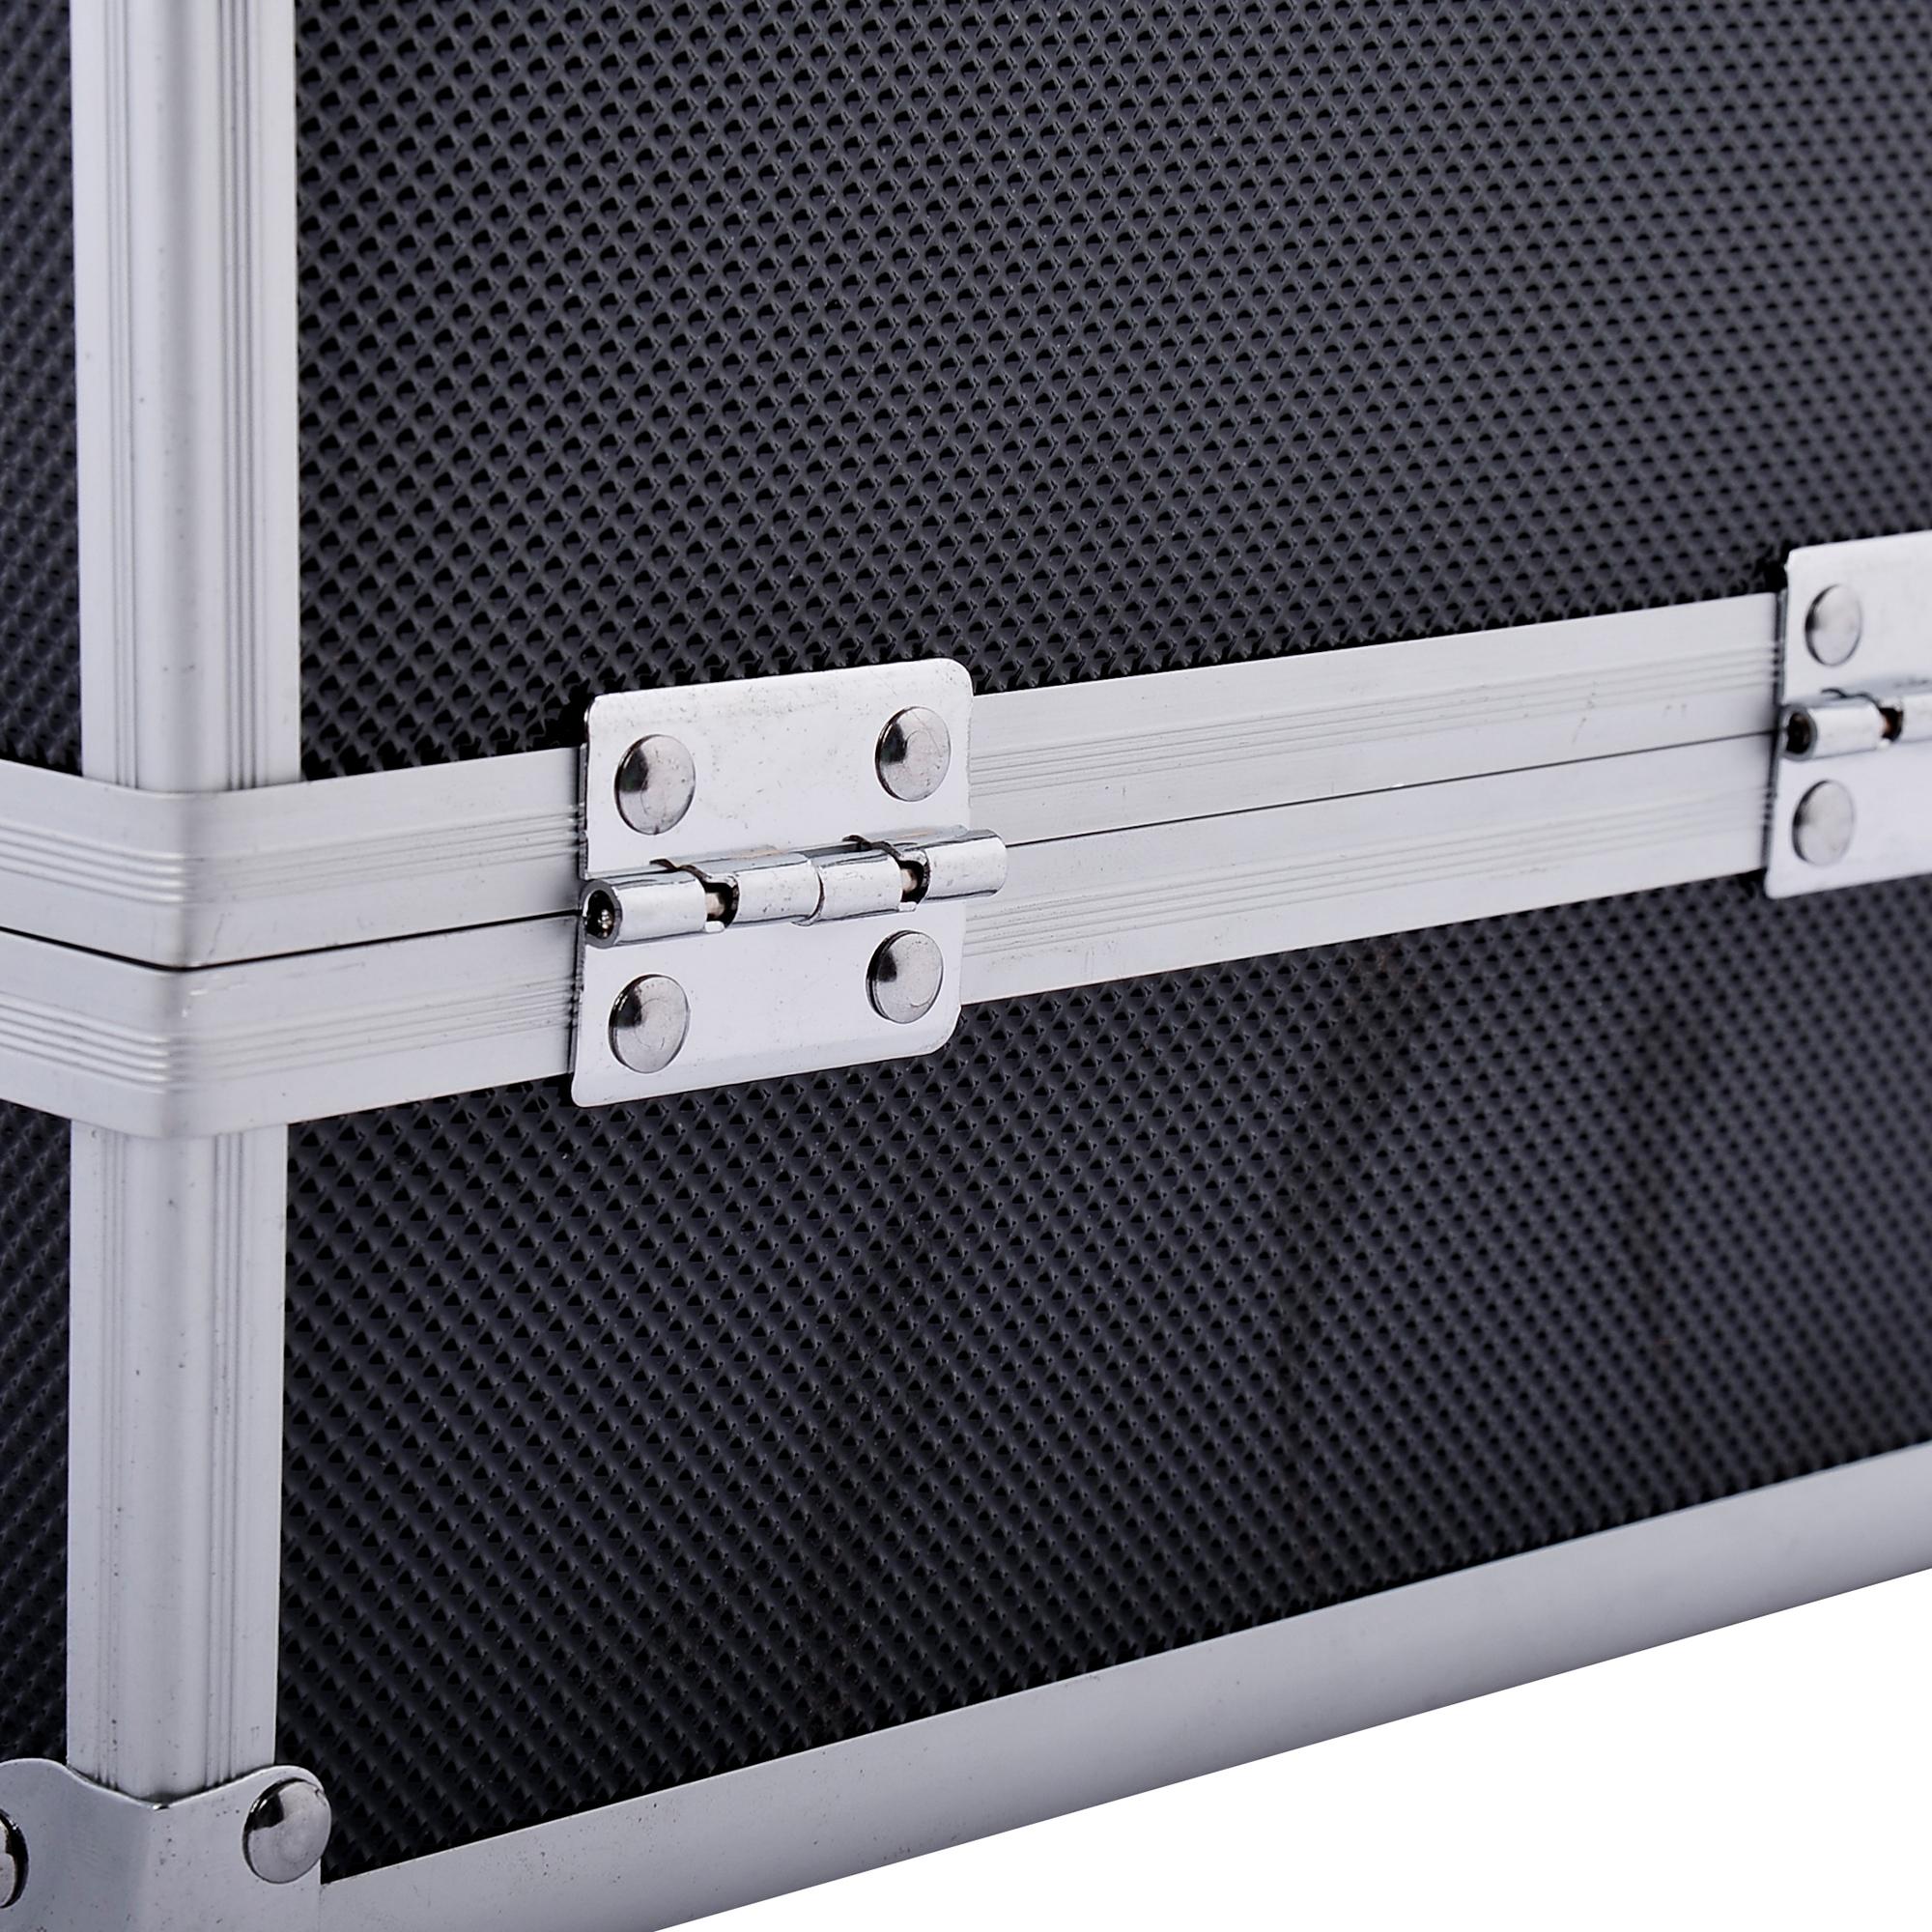 Aluminum-Rolling-Makeup-Train-Case-Trolley-Organizer-Storage-Box-Lockable thumbnail 29